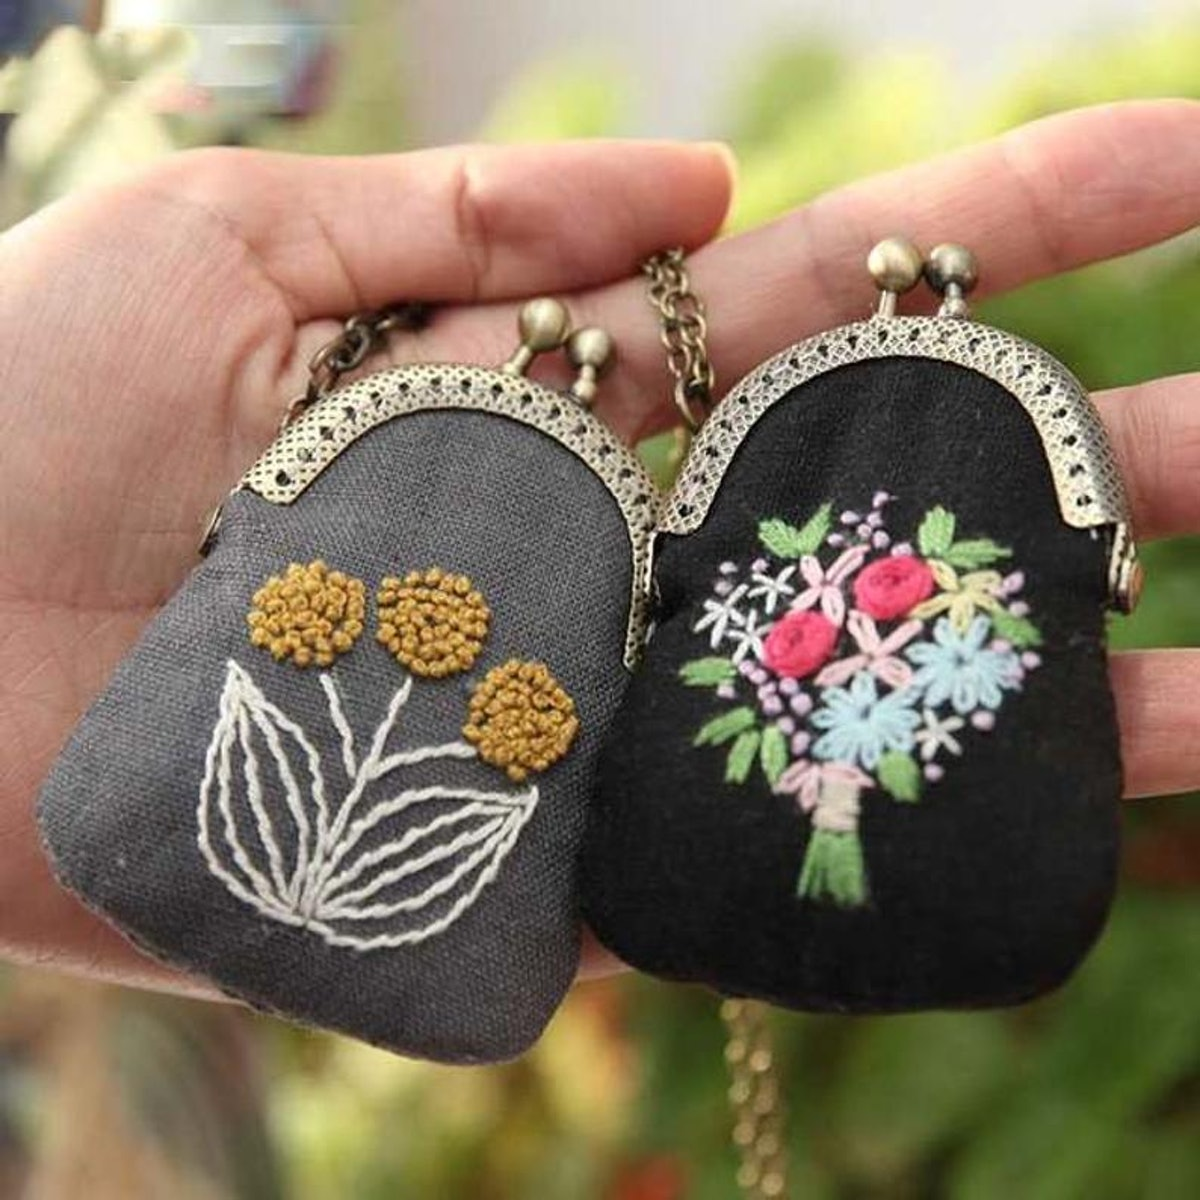 Embroidered Flower Purse DIY Craft Kit